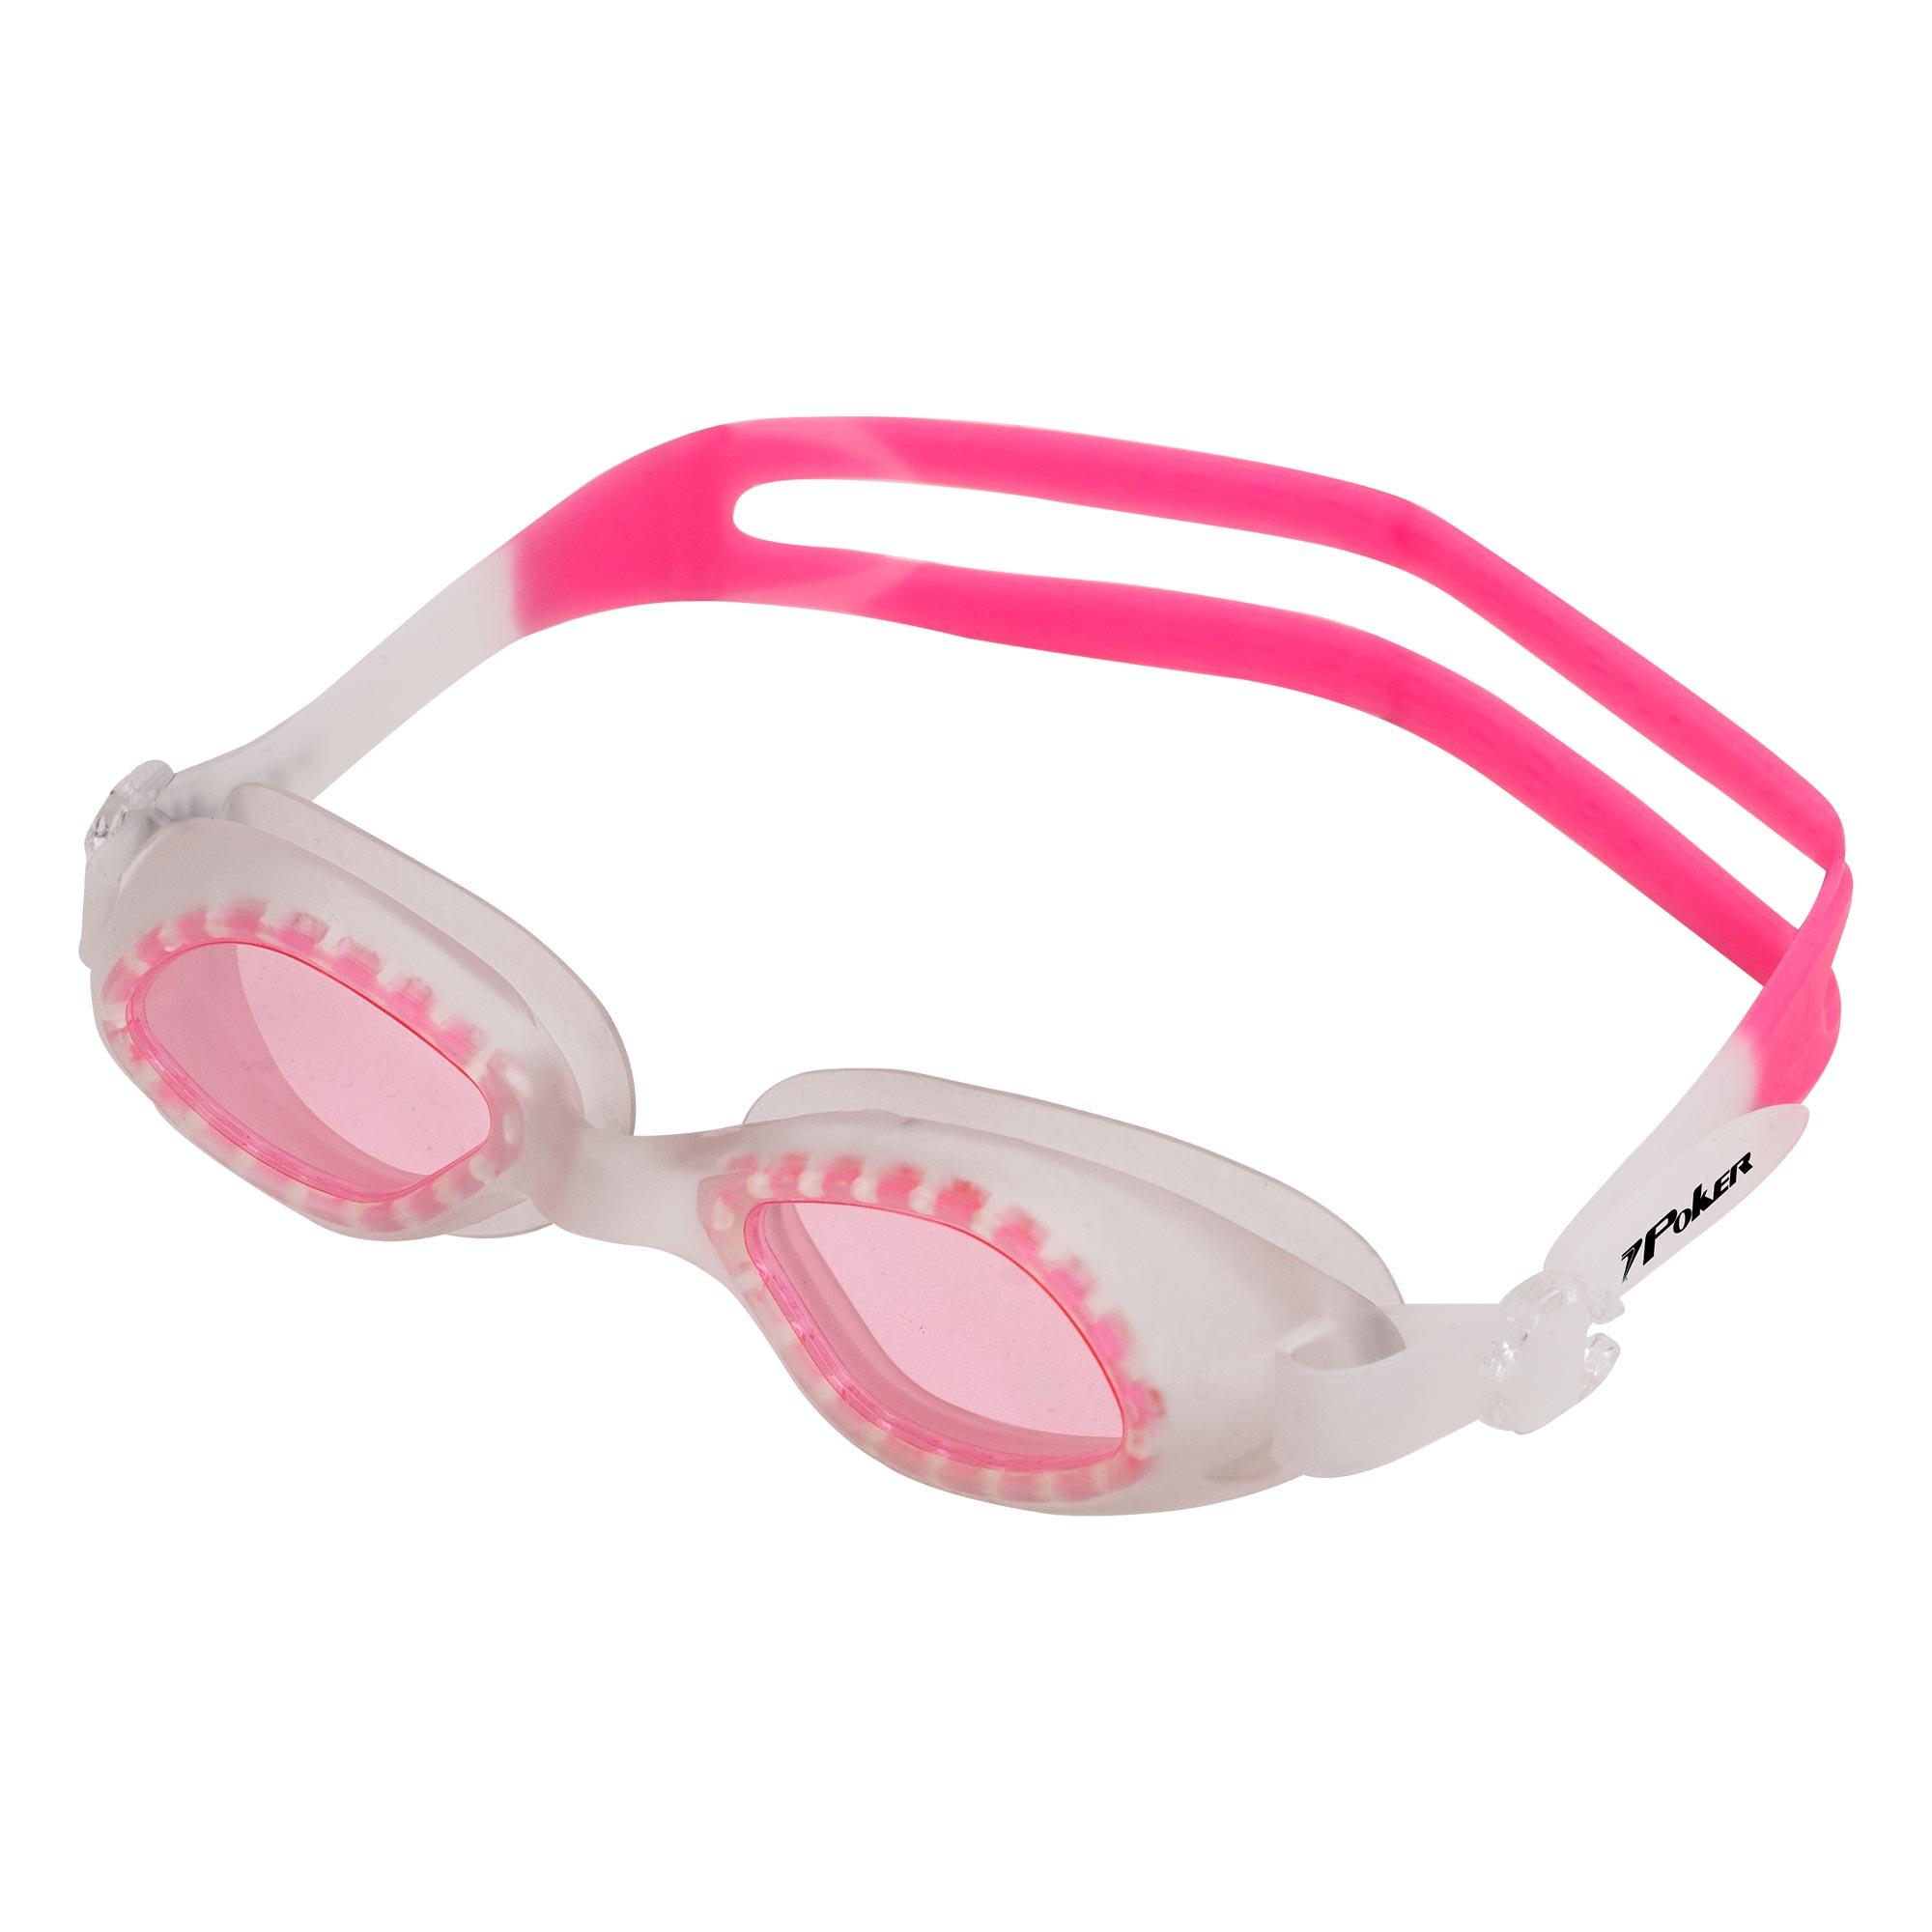 Kit Sunga + Óculos + Toalha Alta Absorção